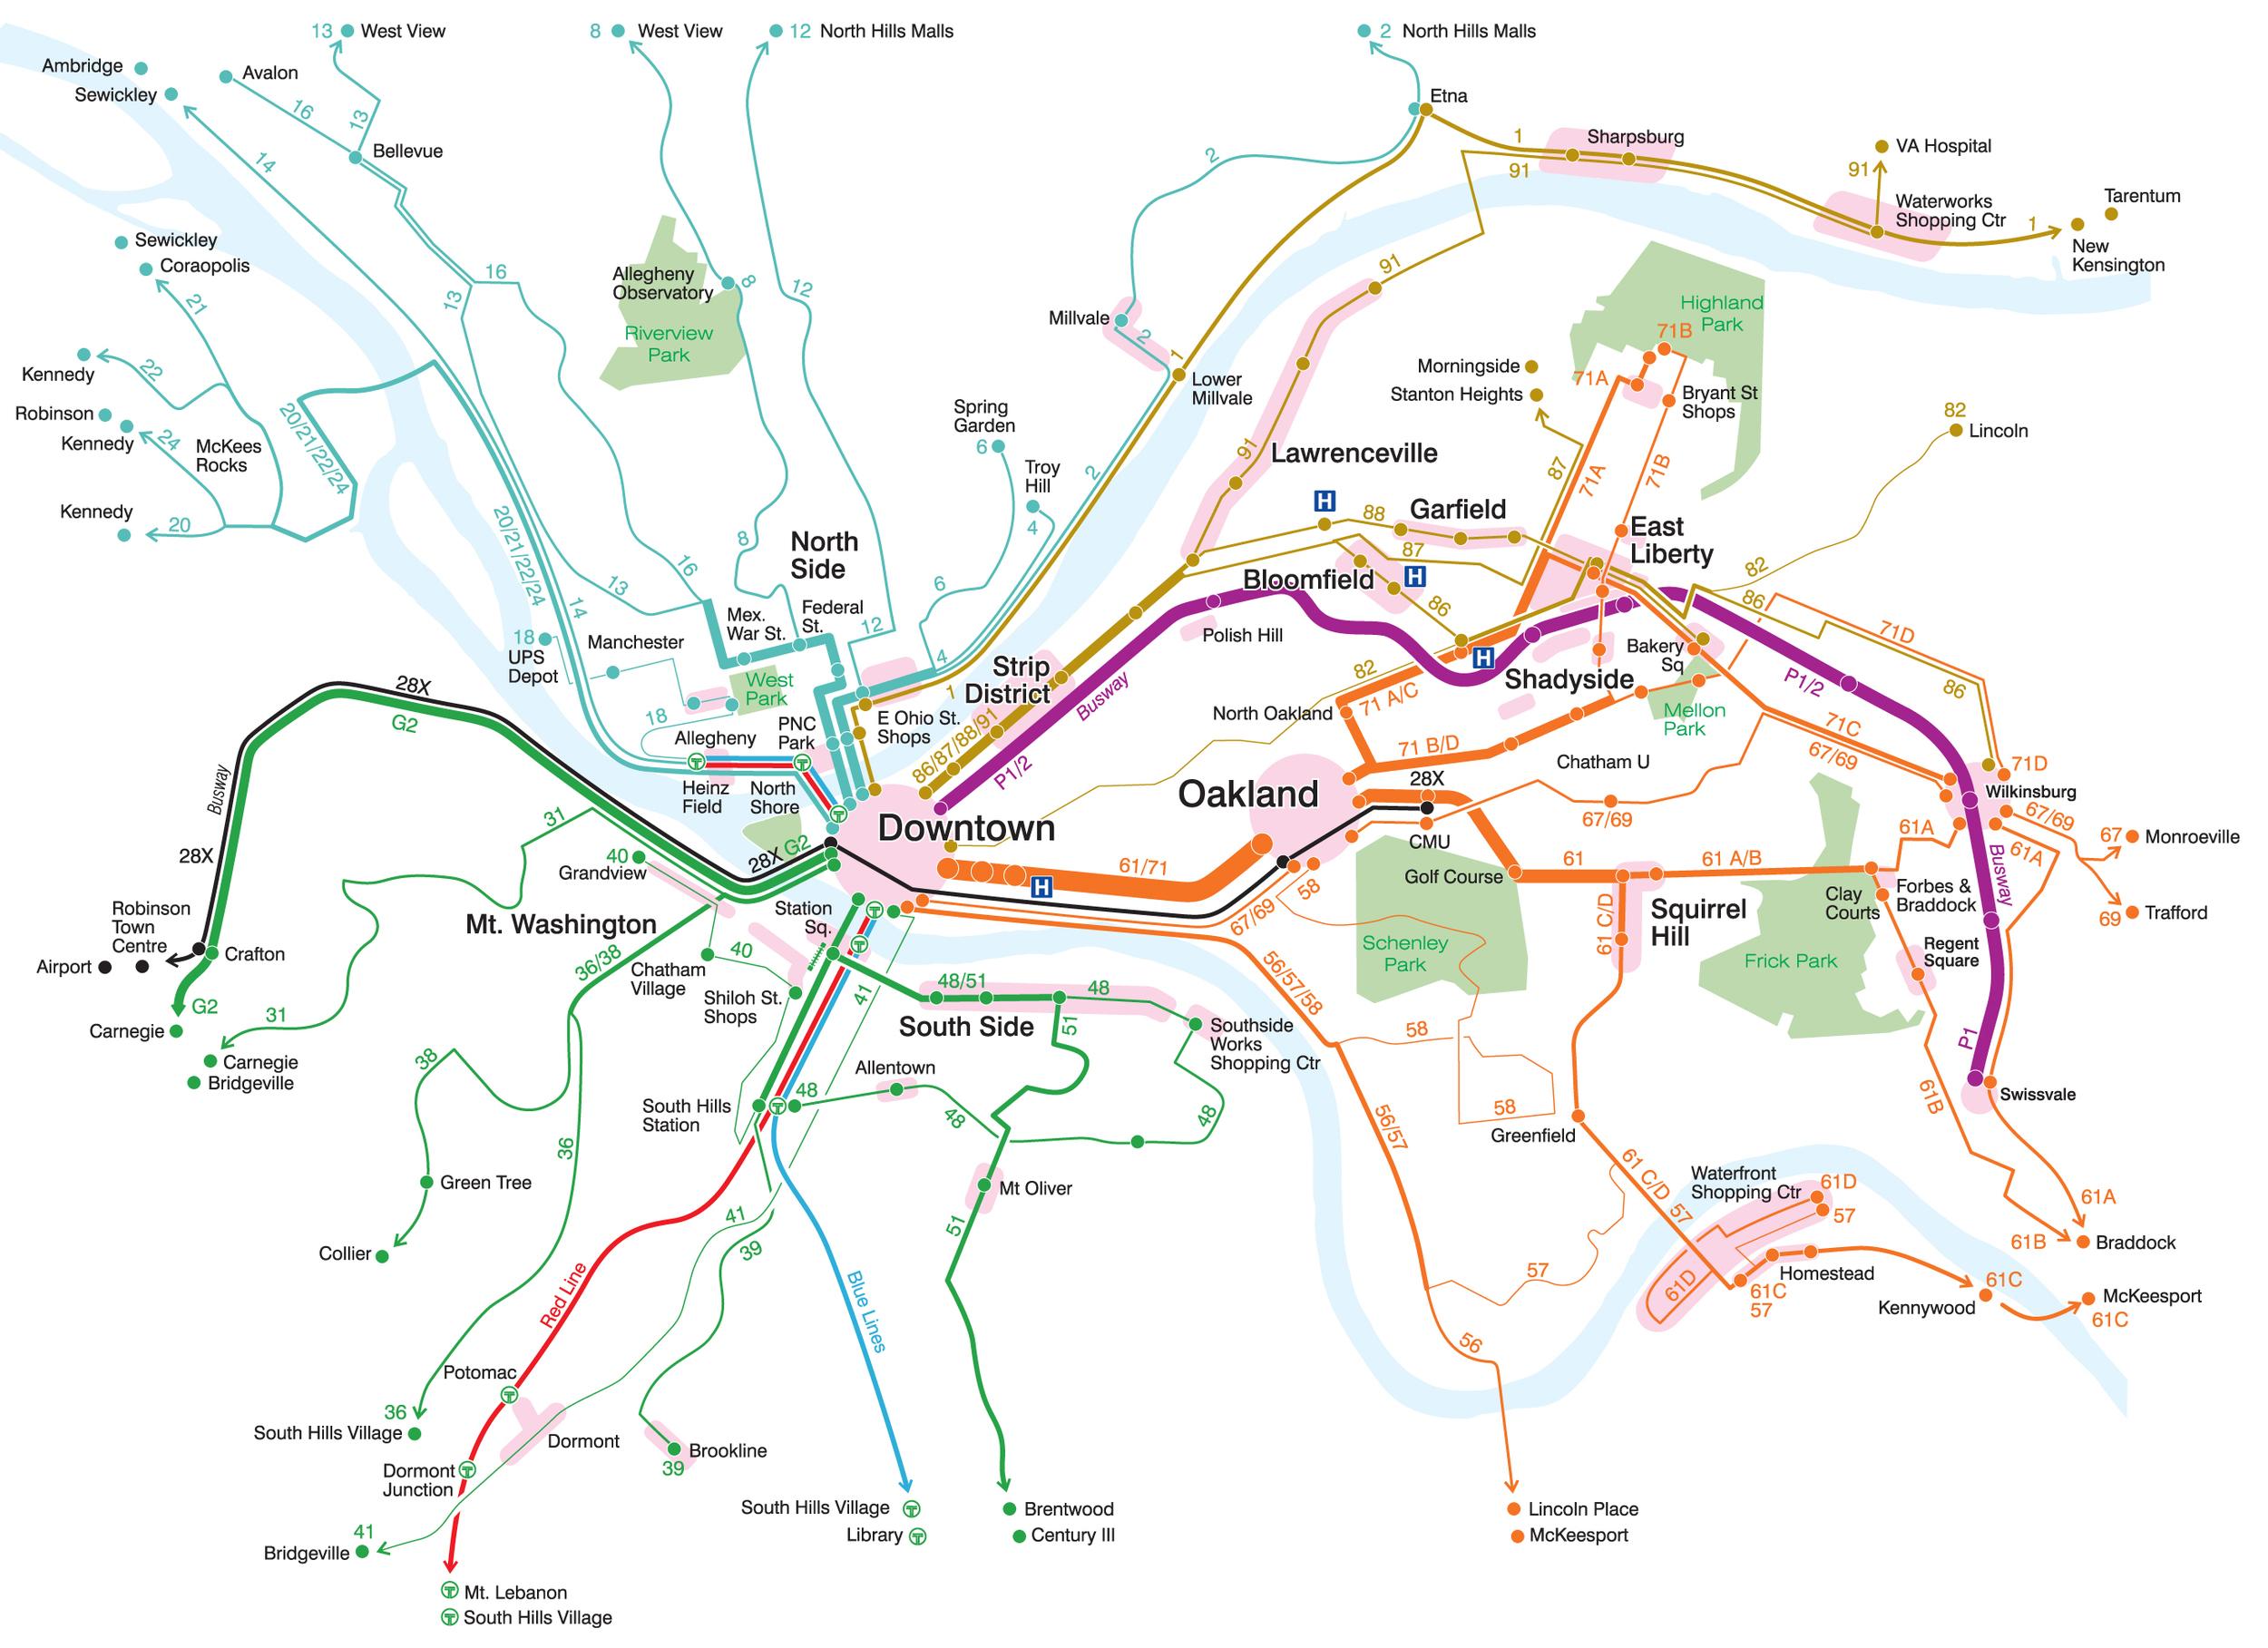 Transit_1mi_DT.jpg